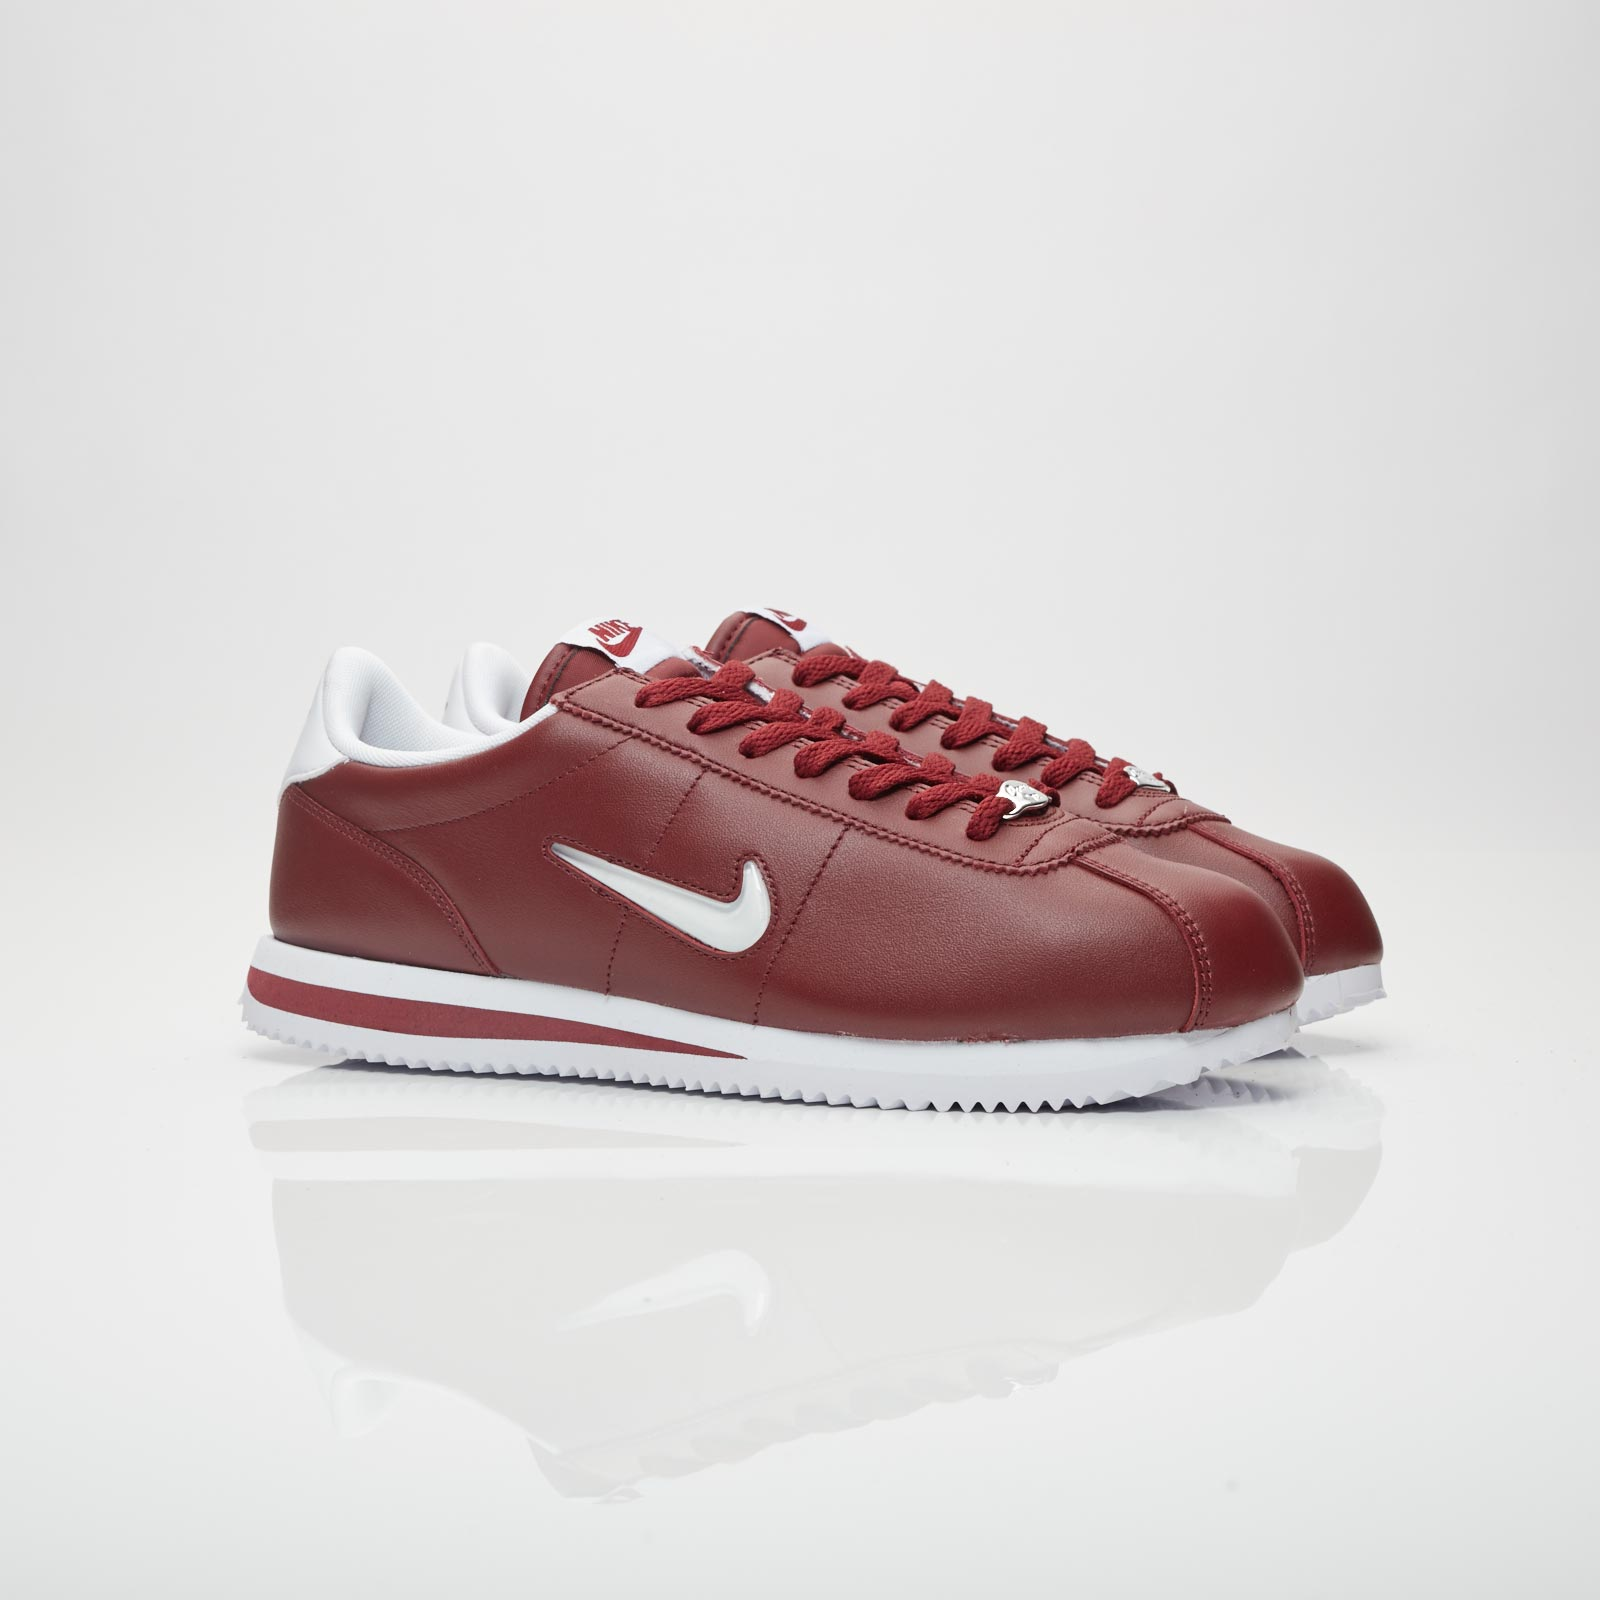 official photos ff70f c41b9 Nike Cortez Basic Jewel - 833238-600 - Sneakersnstuff ...